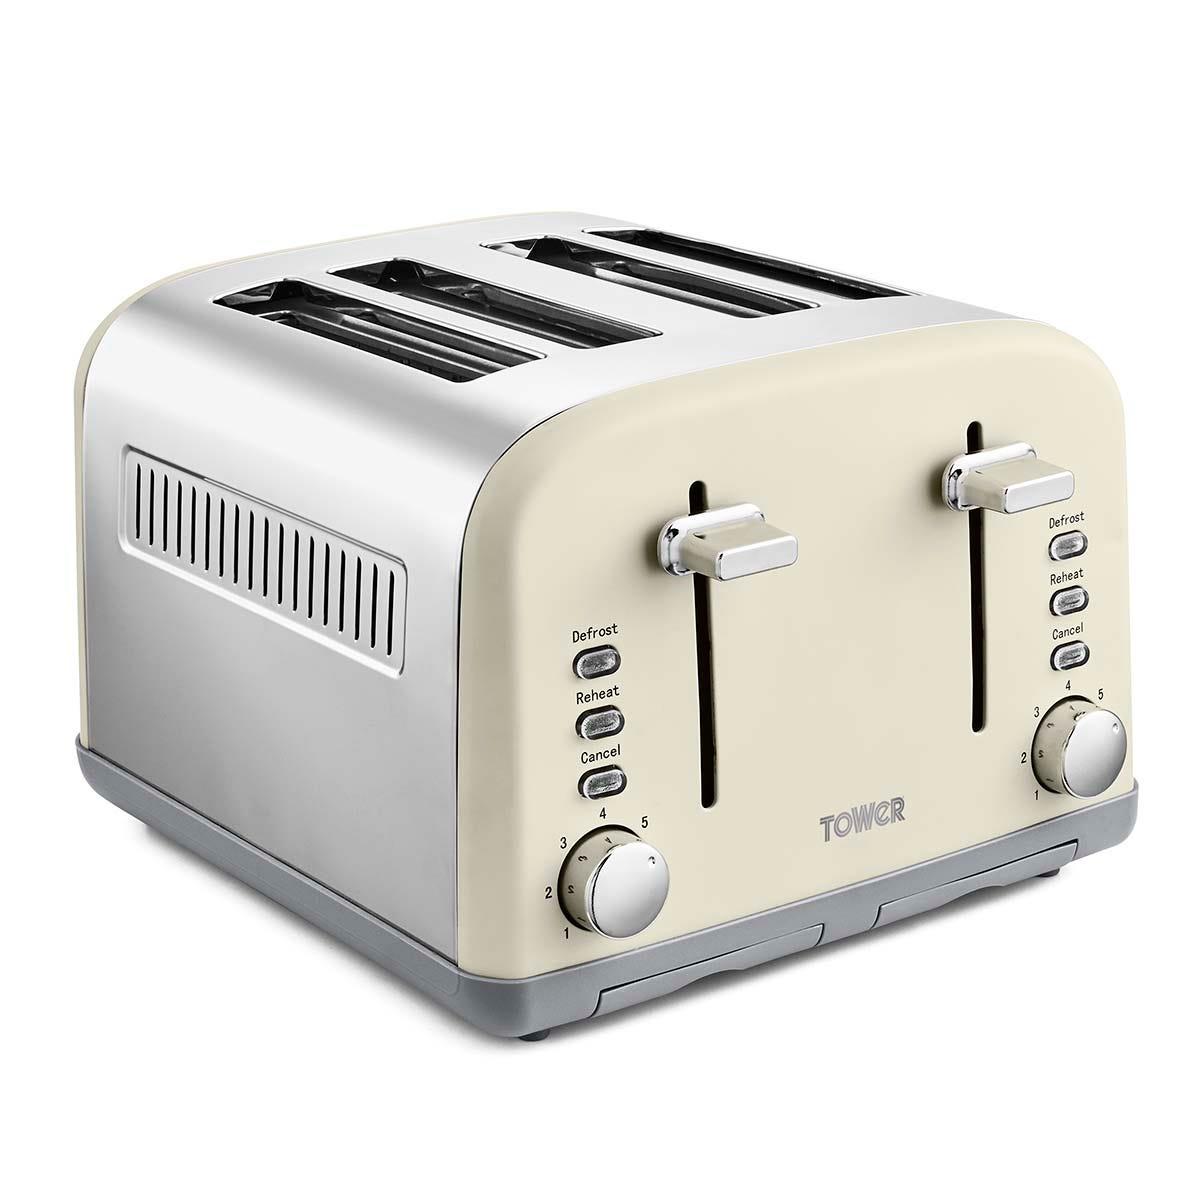 Tower T20042PEB Infinity Stone 4 Slice Toaster - Cream